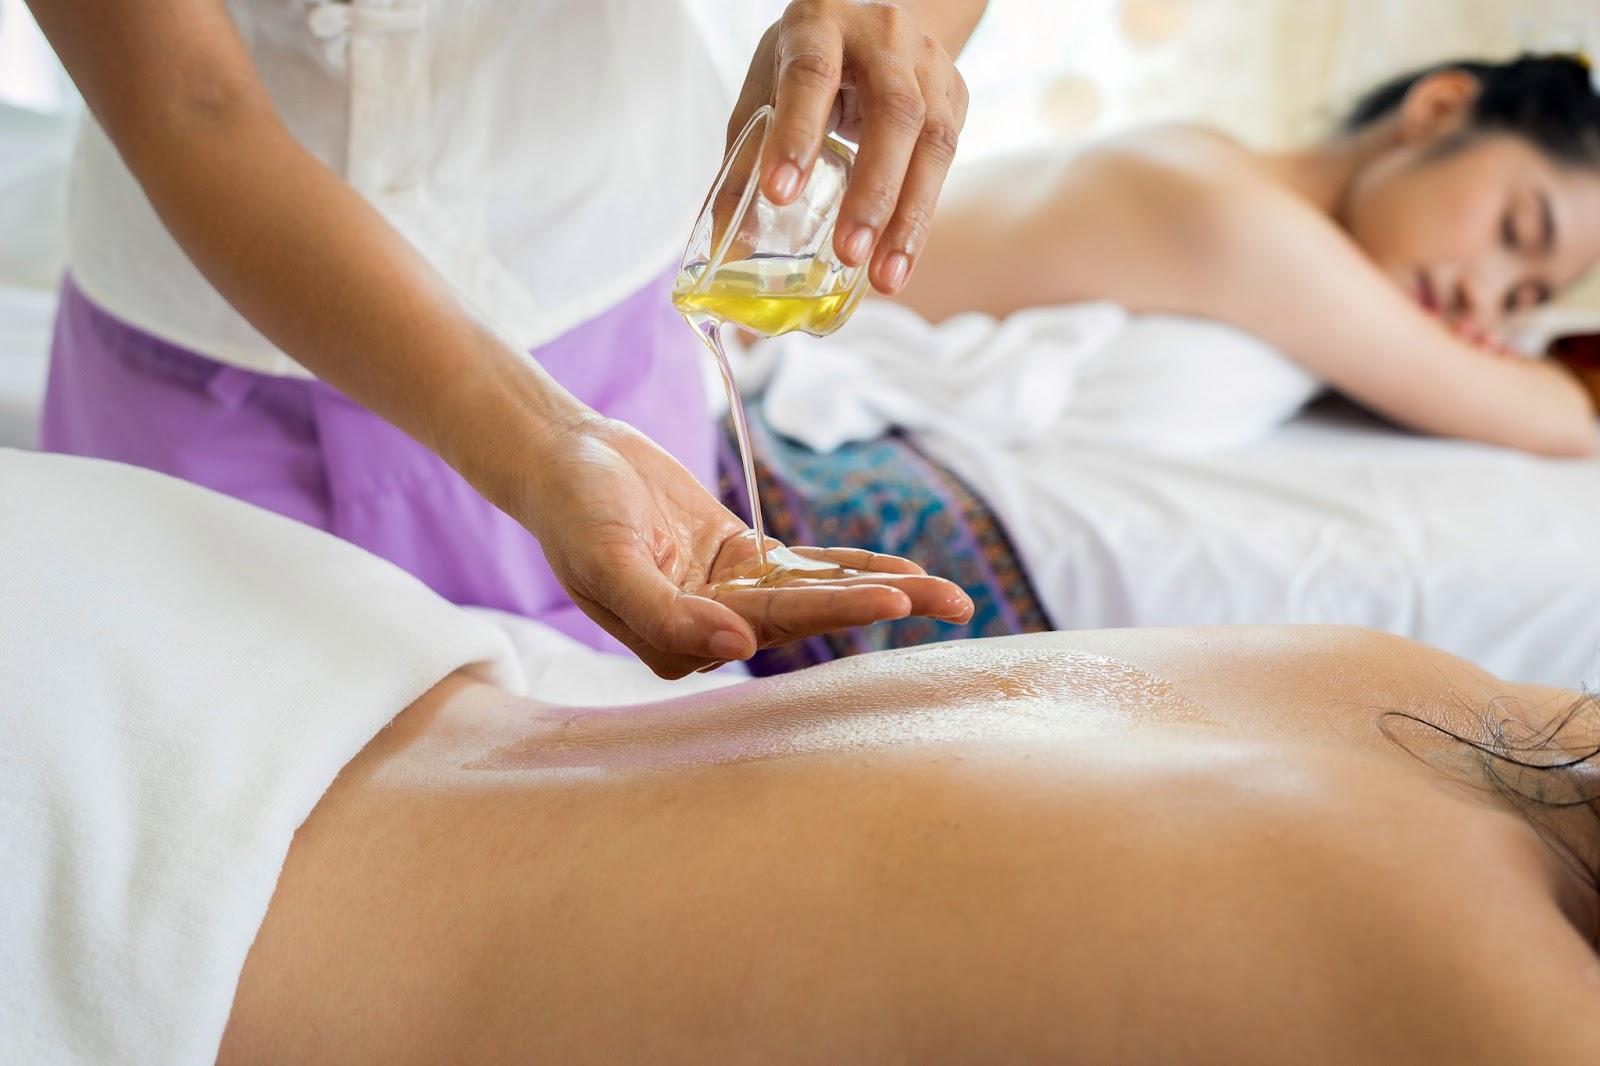 massage newly-wed activity